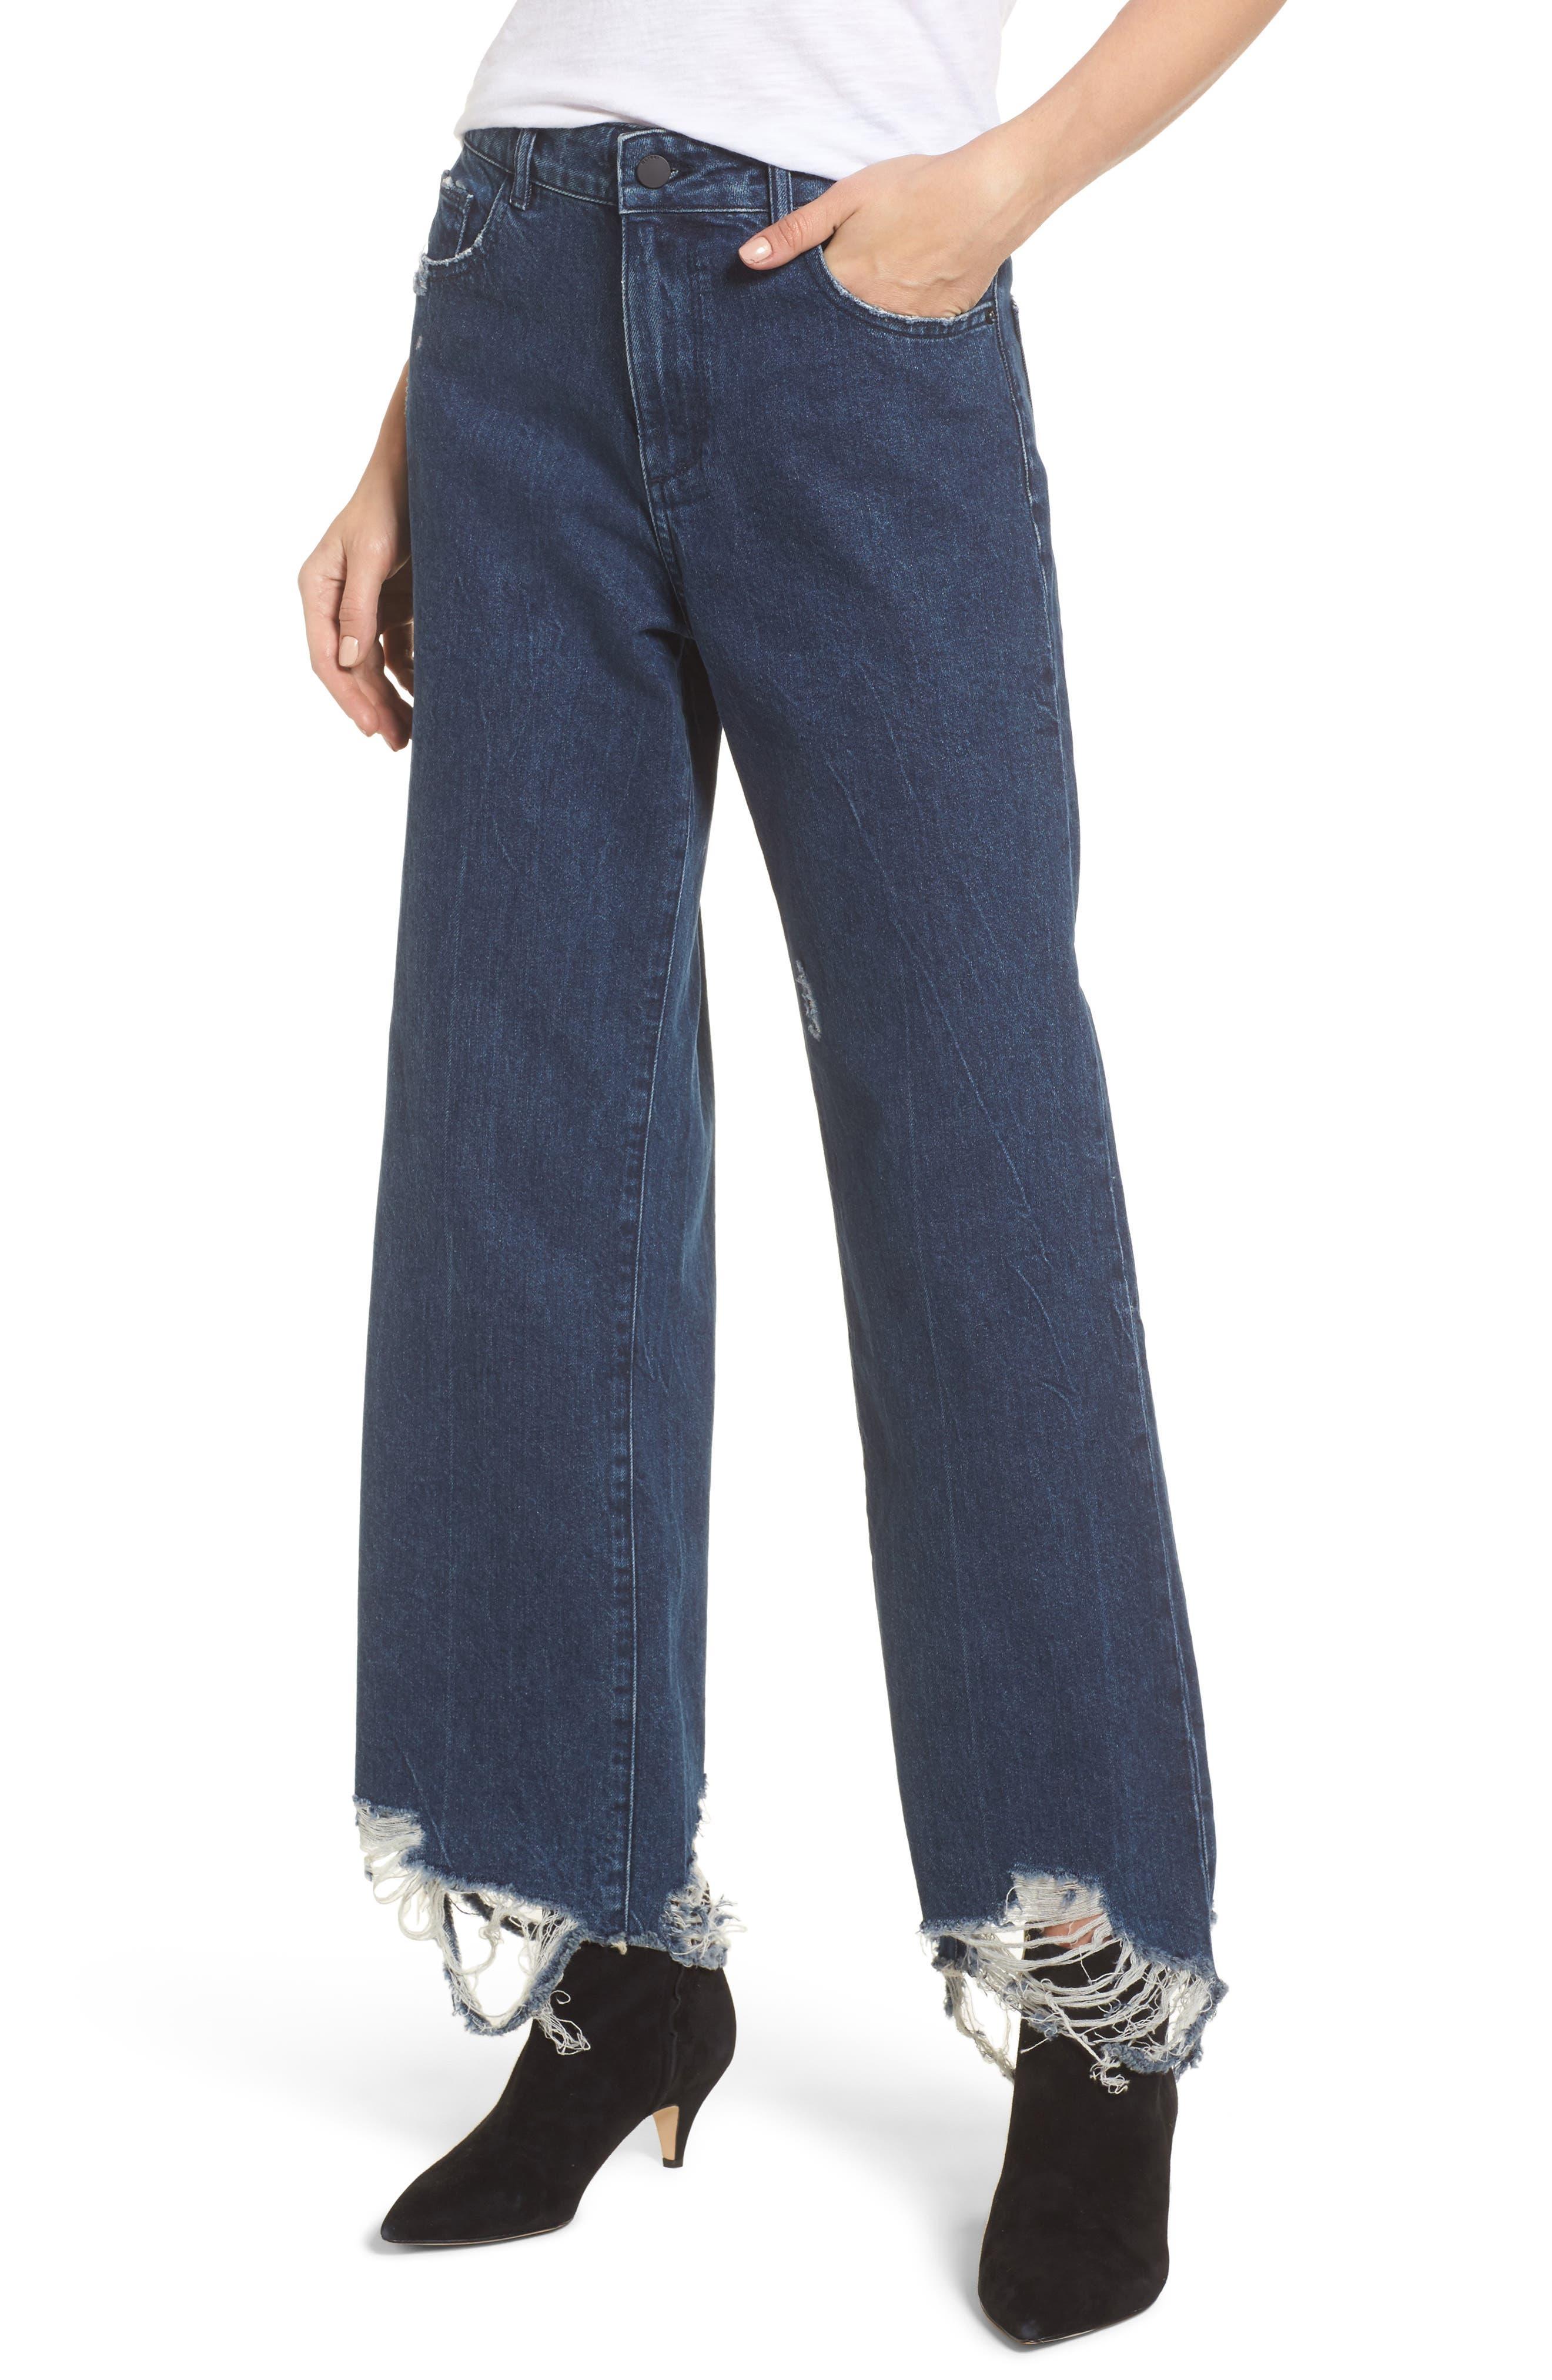 Hepburn High Waist Wide Leg Jeans,                         Main,                         color, Industry